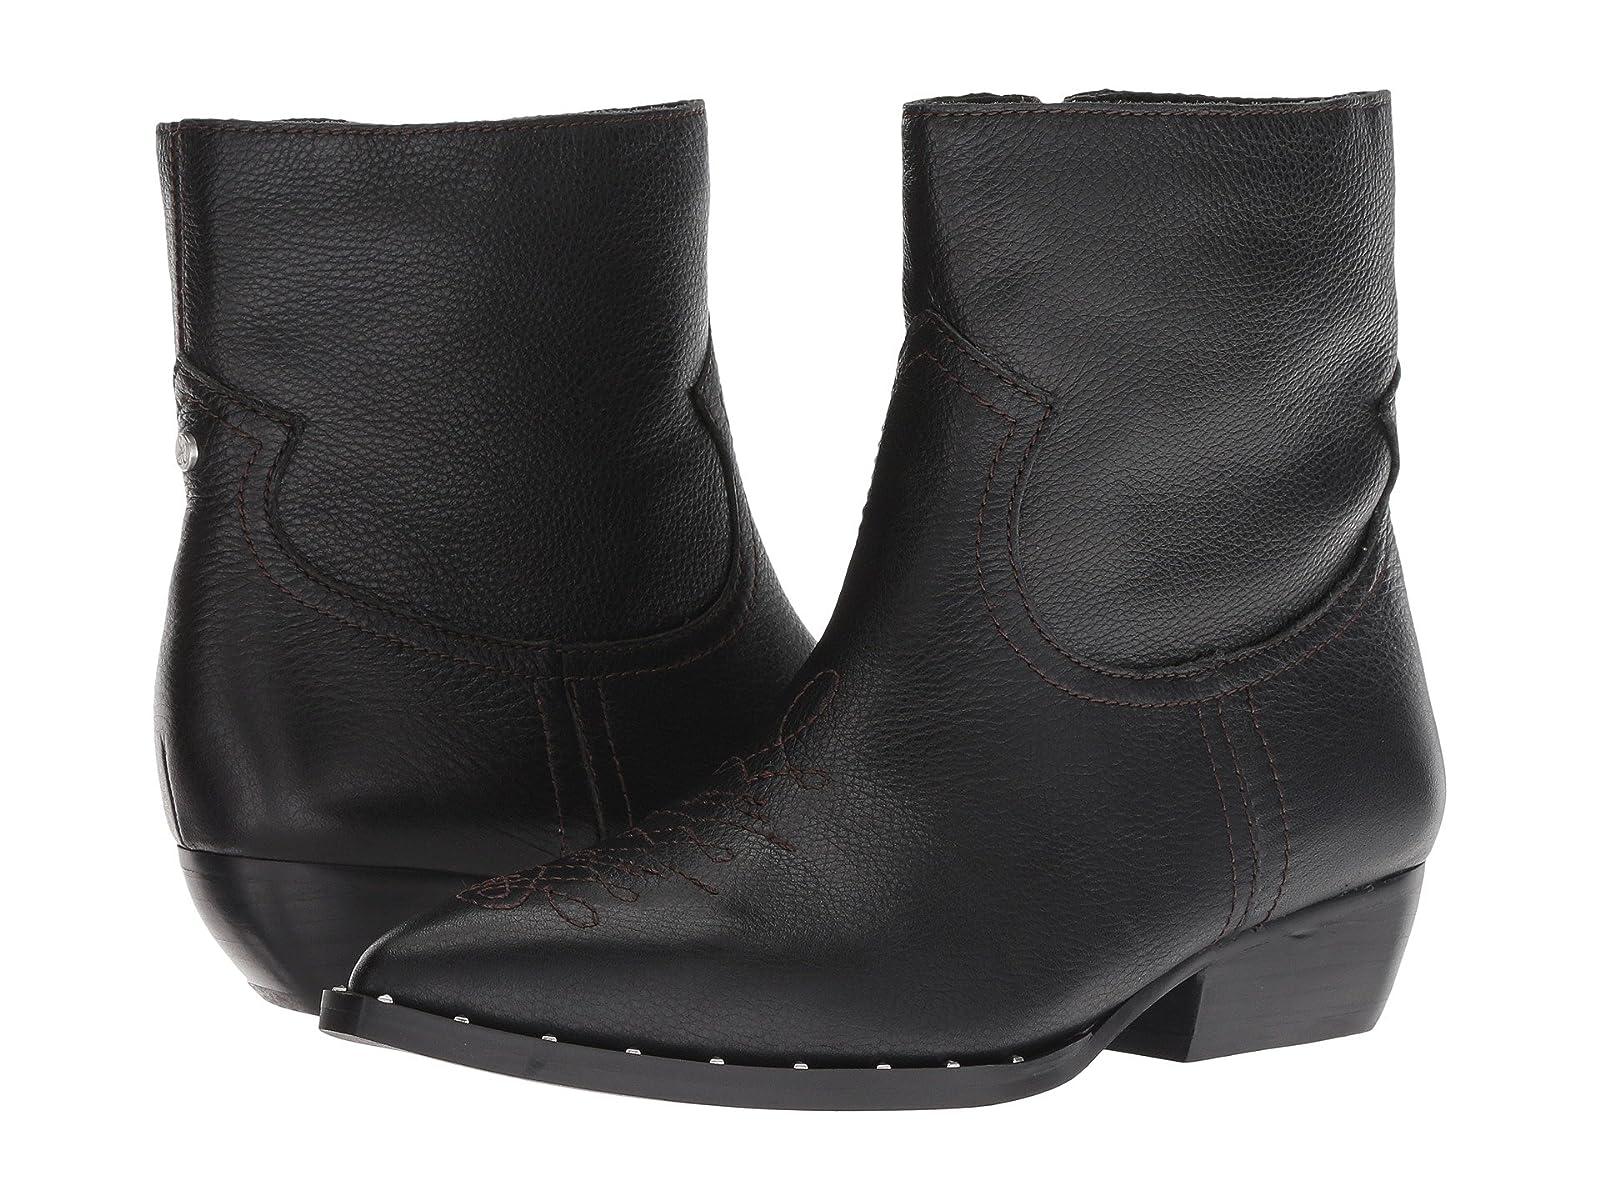 Sam Edelman AvaEconomical and quality shoes